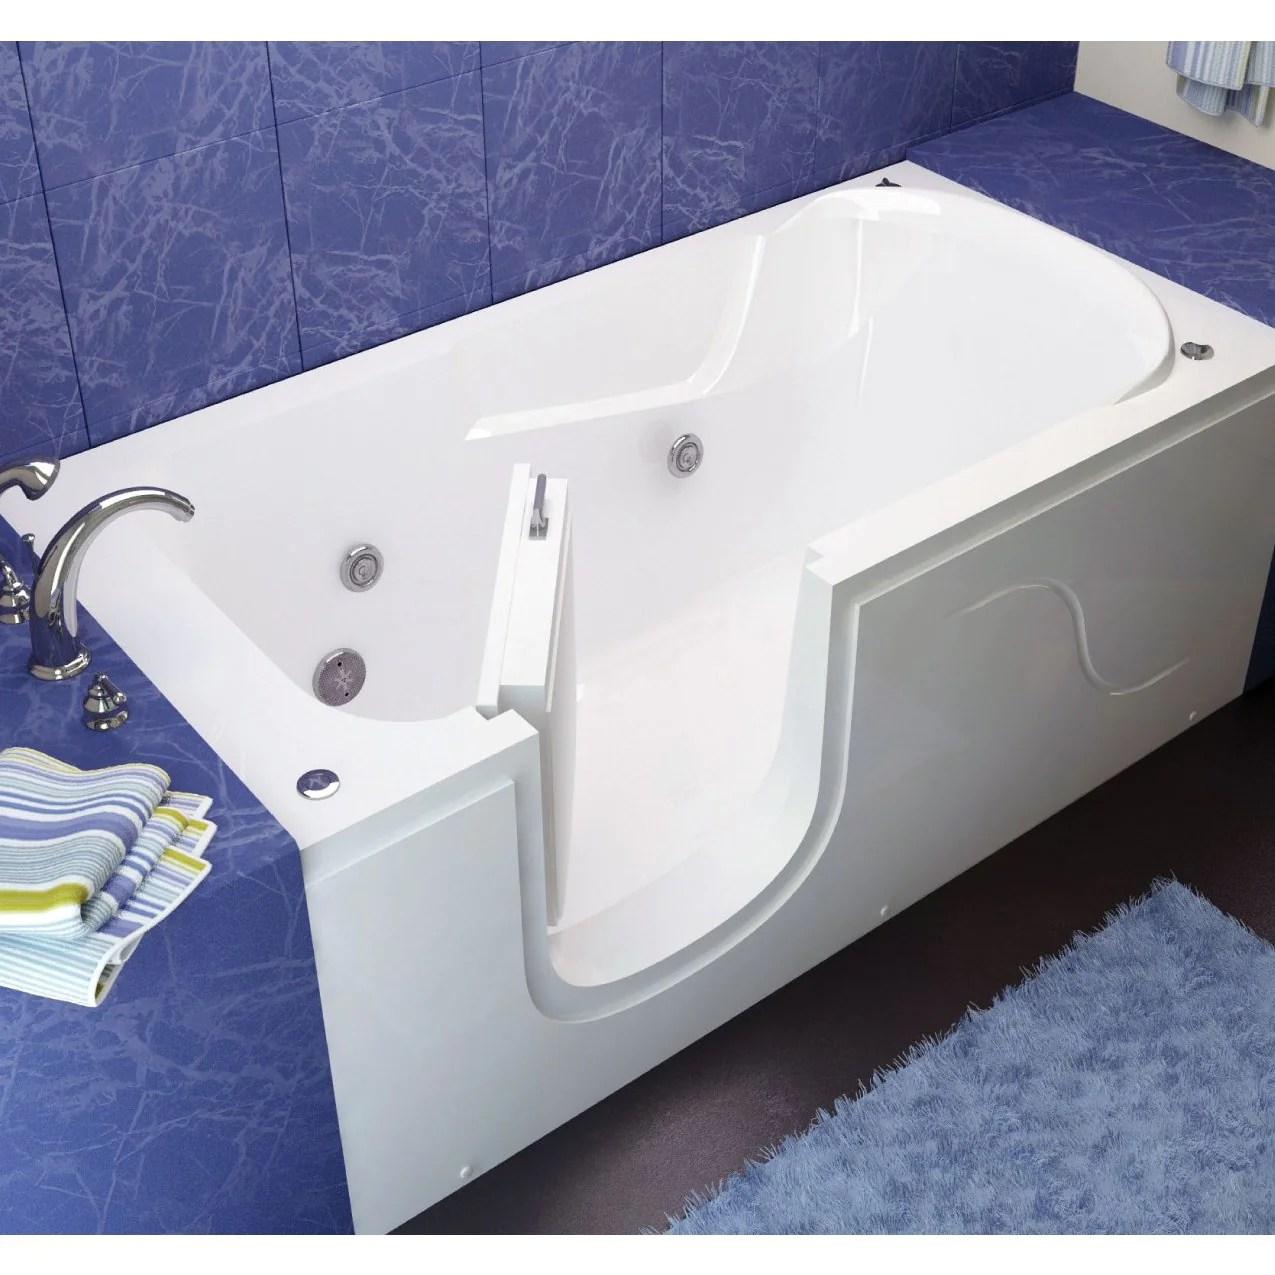 MediTub 3060SI Series StepIn 30 x 60 Acrylic Fiberglass WalkIn Batht  Luxury Freestanding Tubs